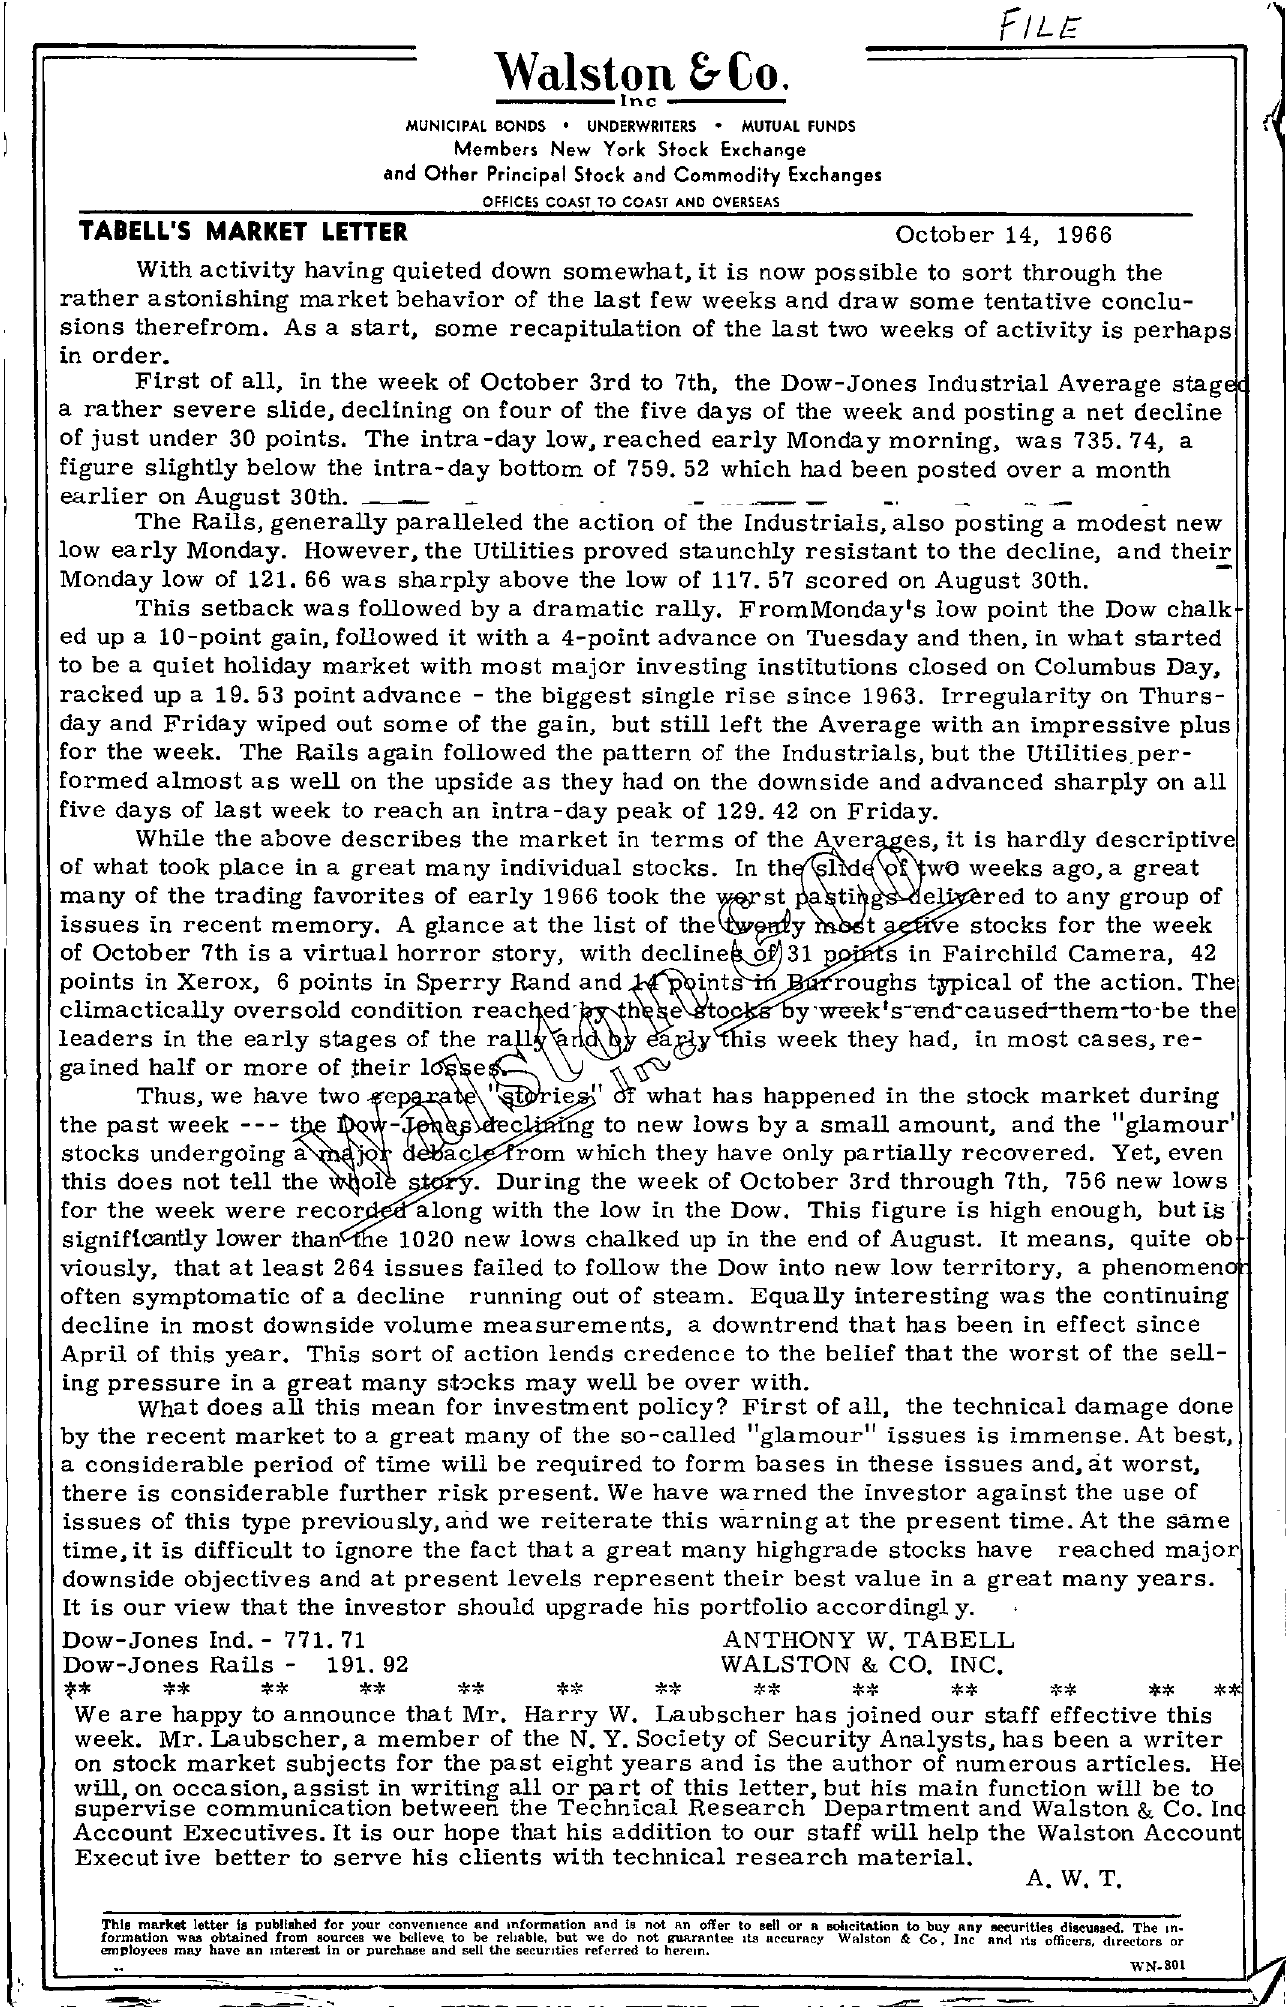 Tabell's Market Letter - October 14, 1966